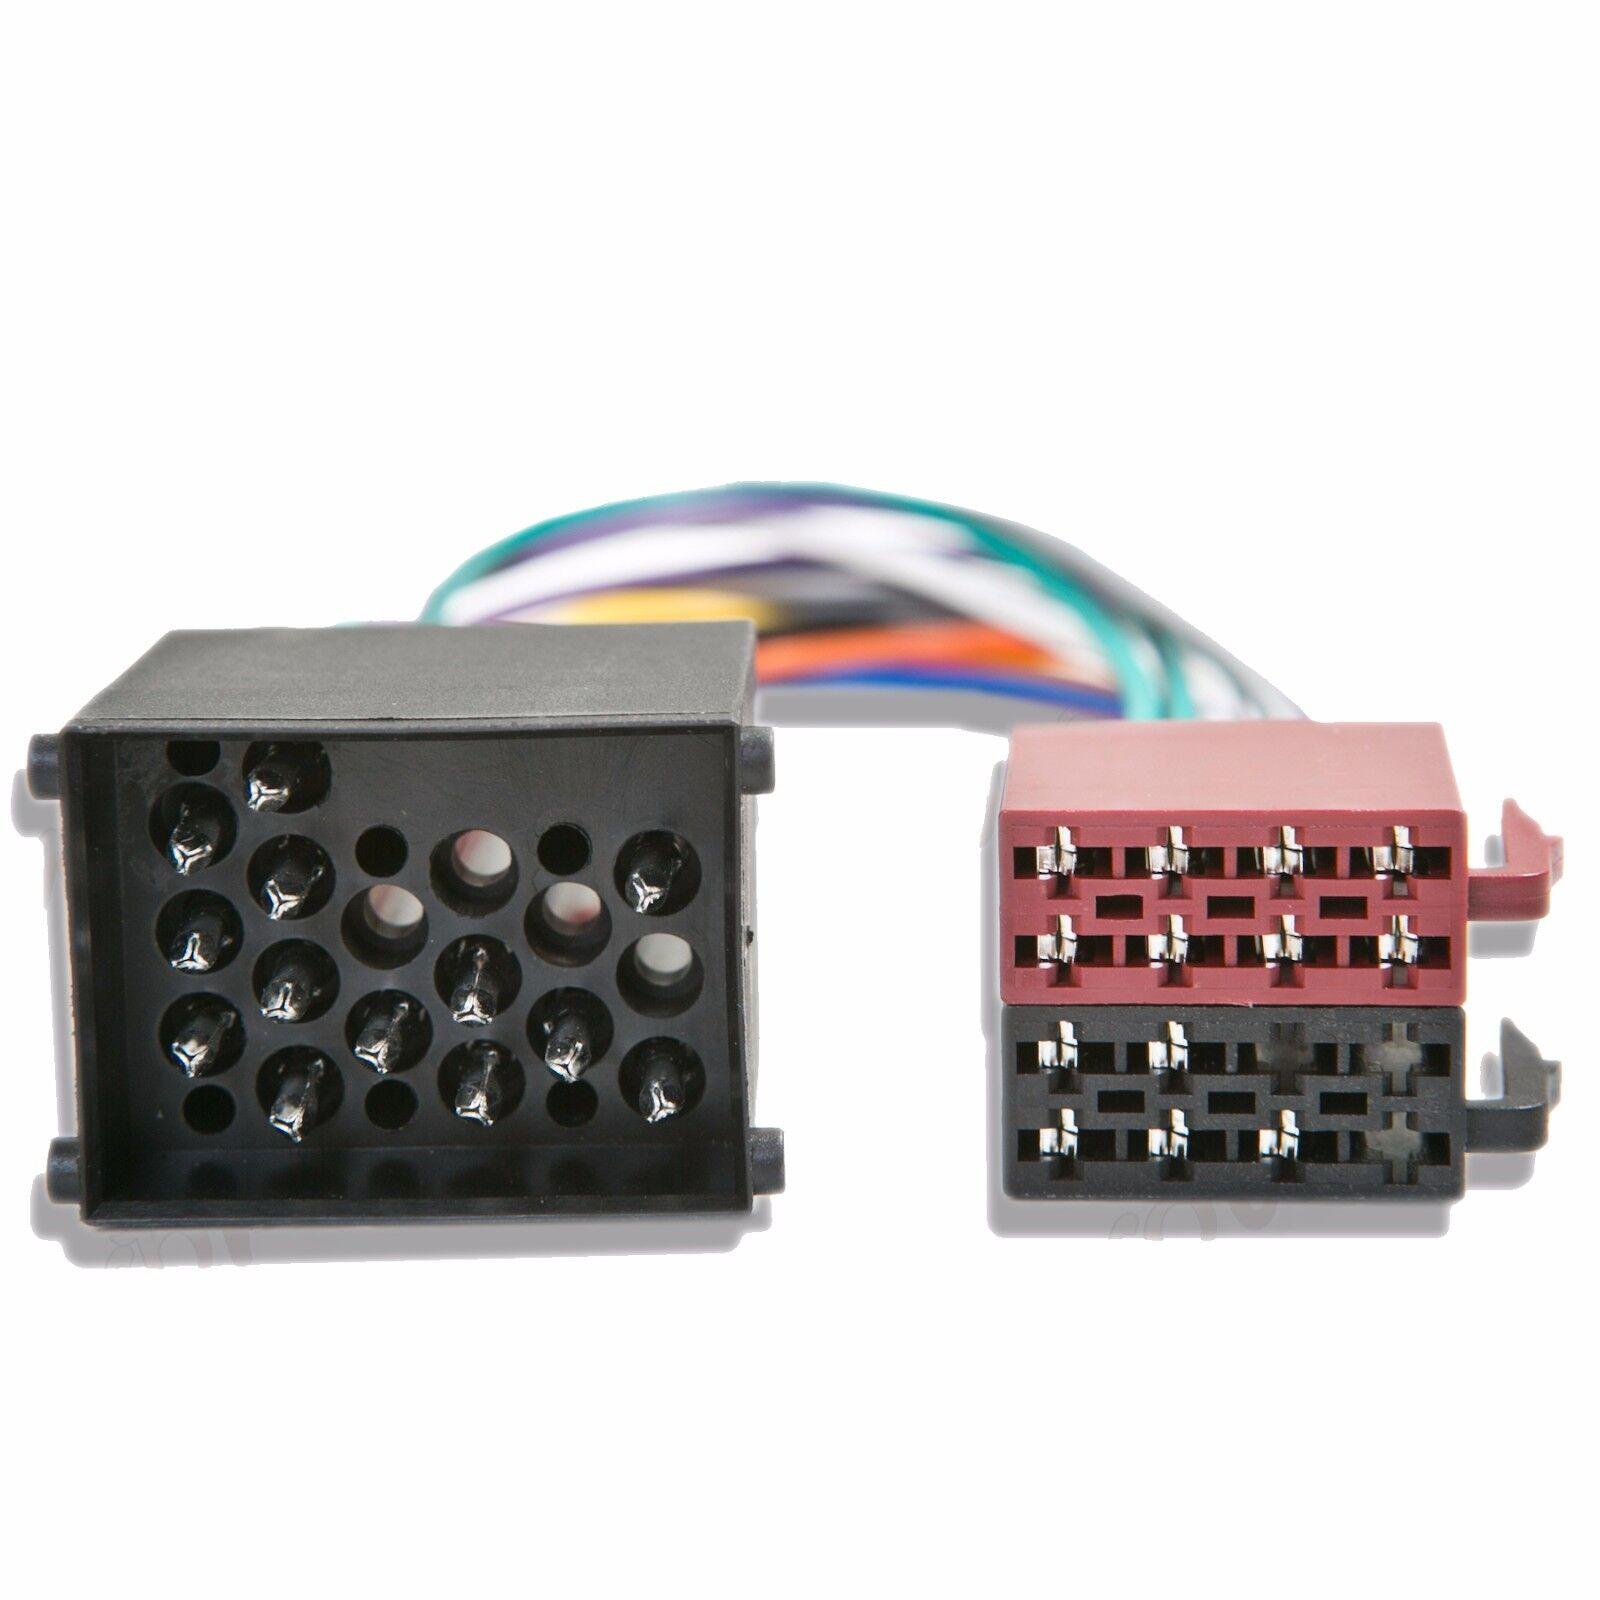 Bmw Mini Iso Stereo Car Audio Head Unit Harness Adaptor Wiring Lead Connectors